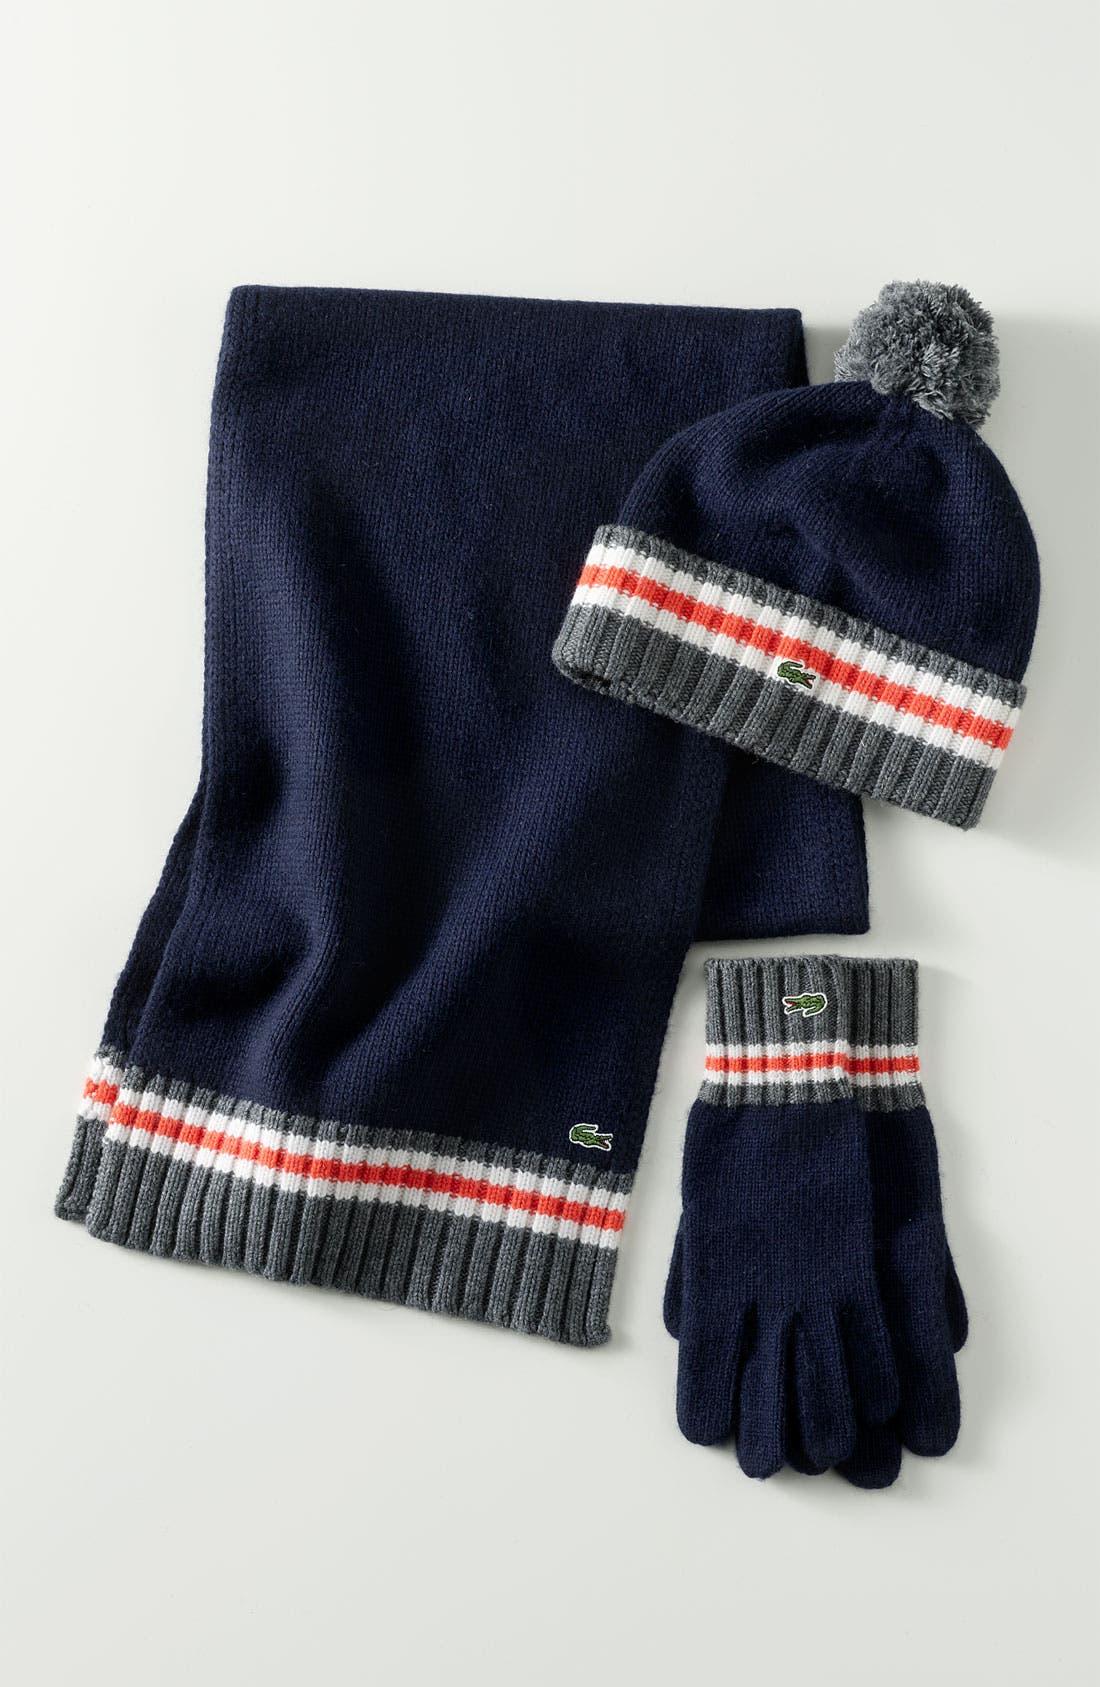 'Toboggan' Knit Gloves,                             Alternate thumbnail 3, color,                             406